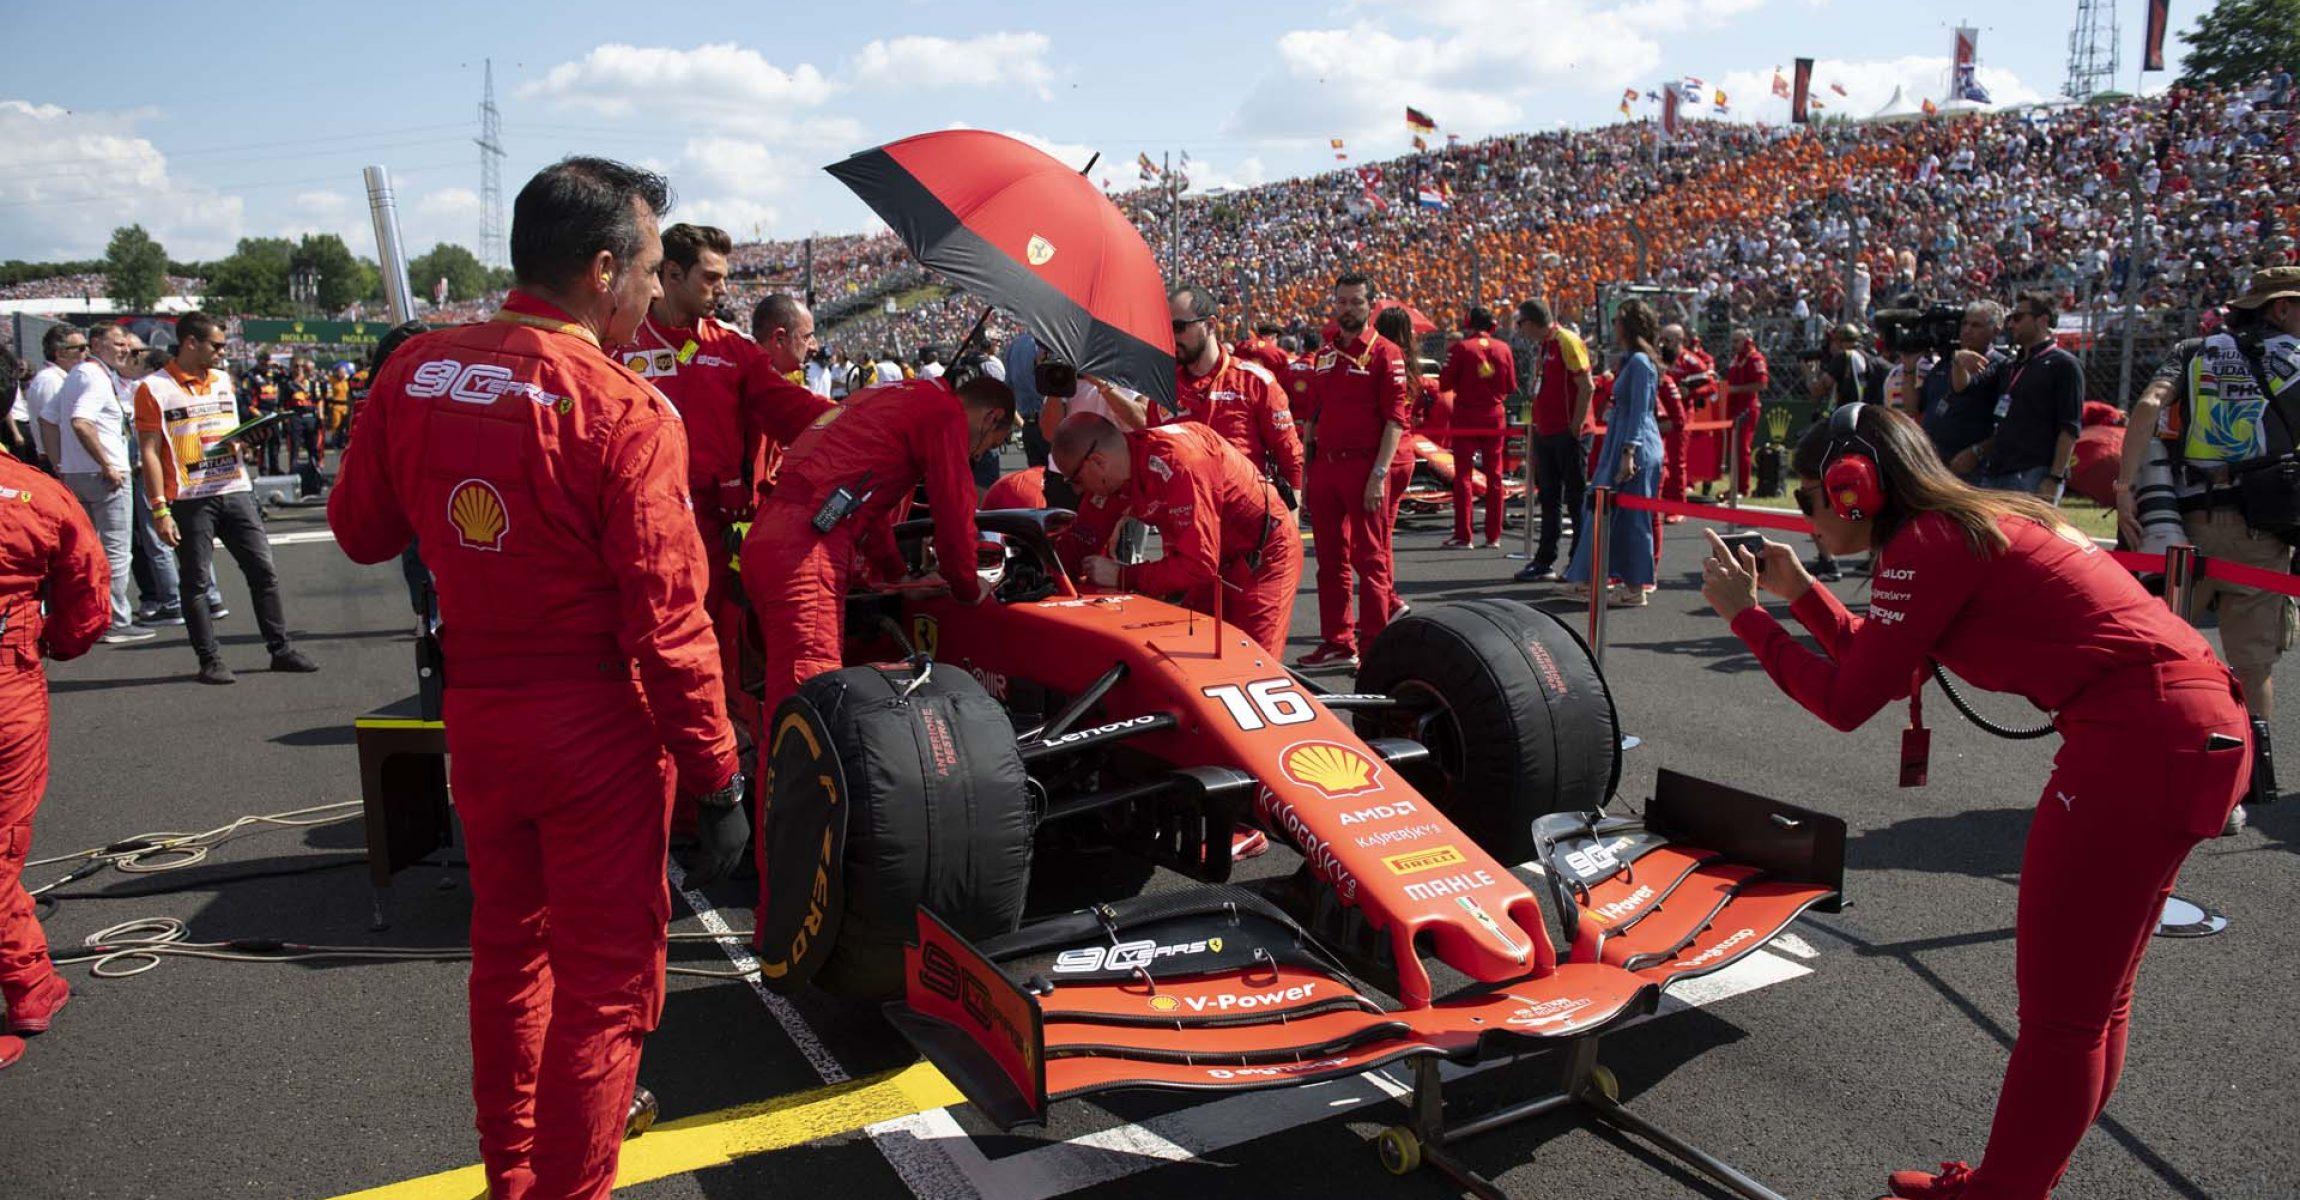 Charles Leclerc, Ferrari, grid, Hungaroring